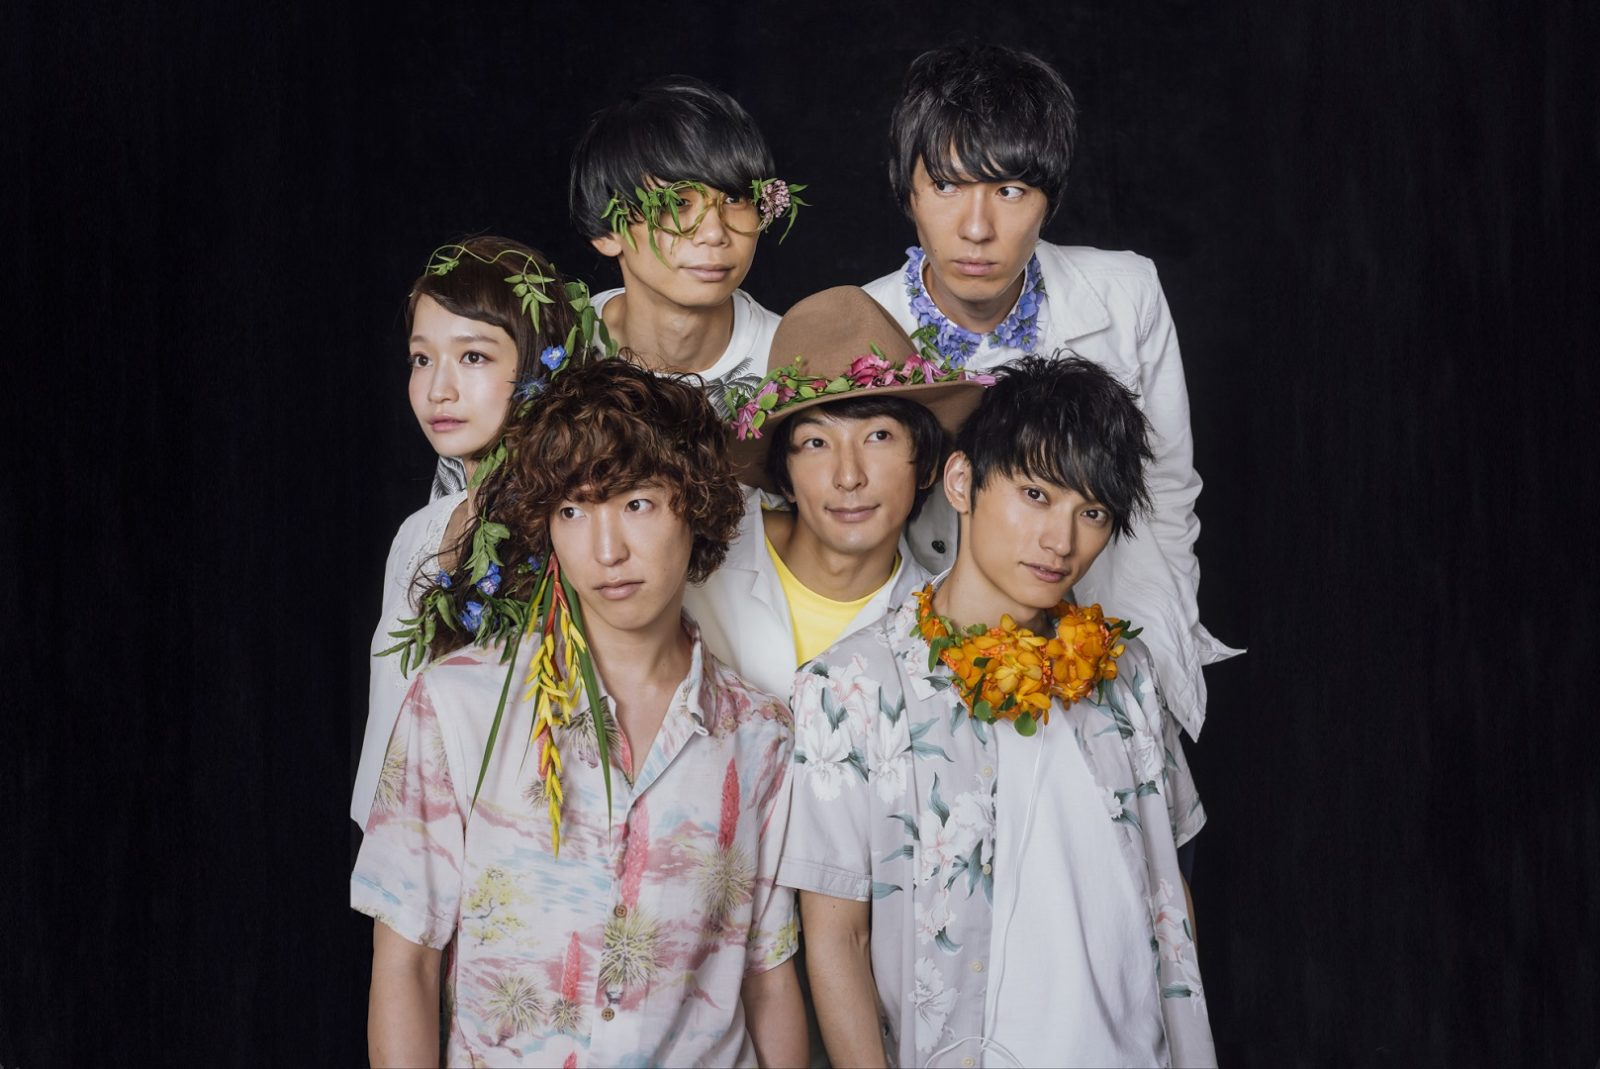 Czecho No Republic×SKY-HI、「タイムトラベリング」初回盤DVDに「ROCK IN JAPAN FESTIVAL」ライブ映像を収録サムネイル画像